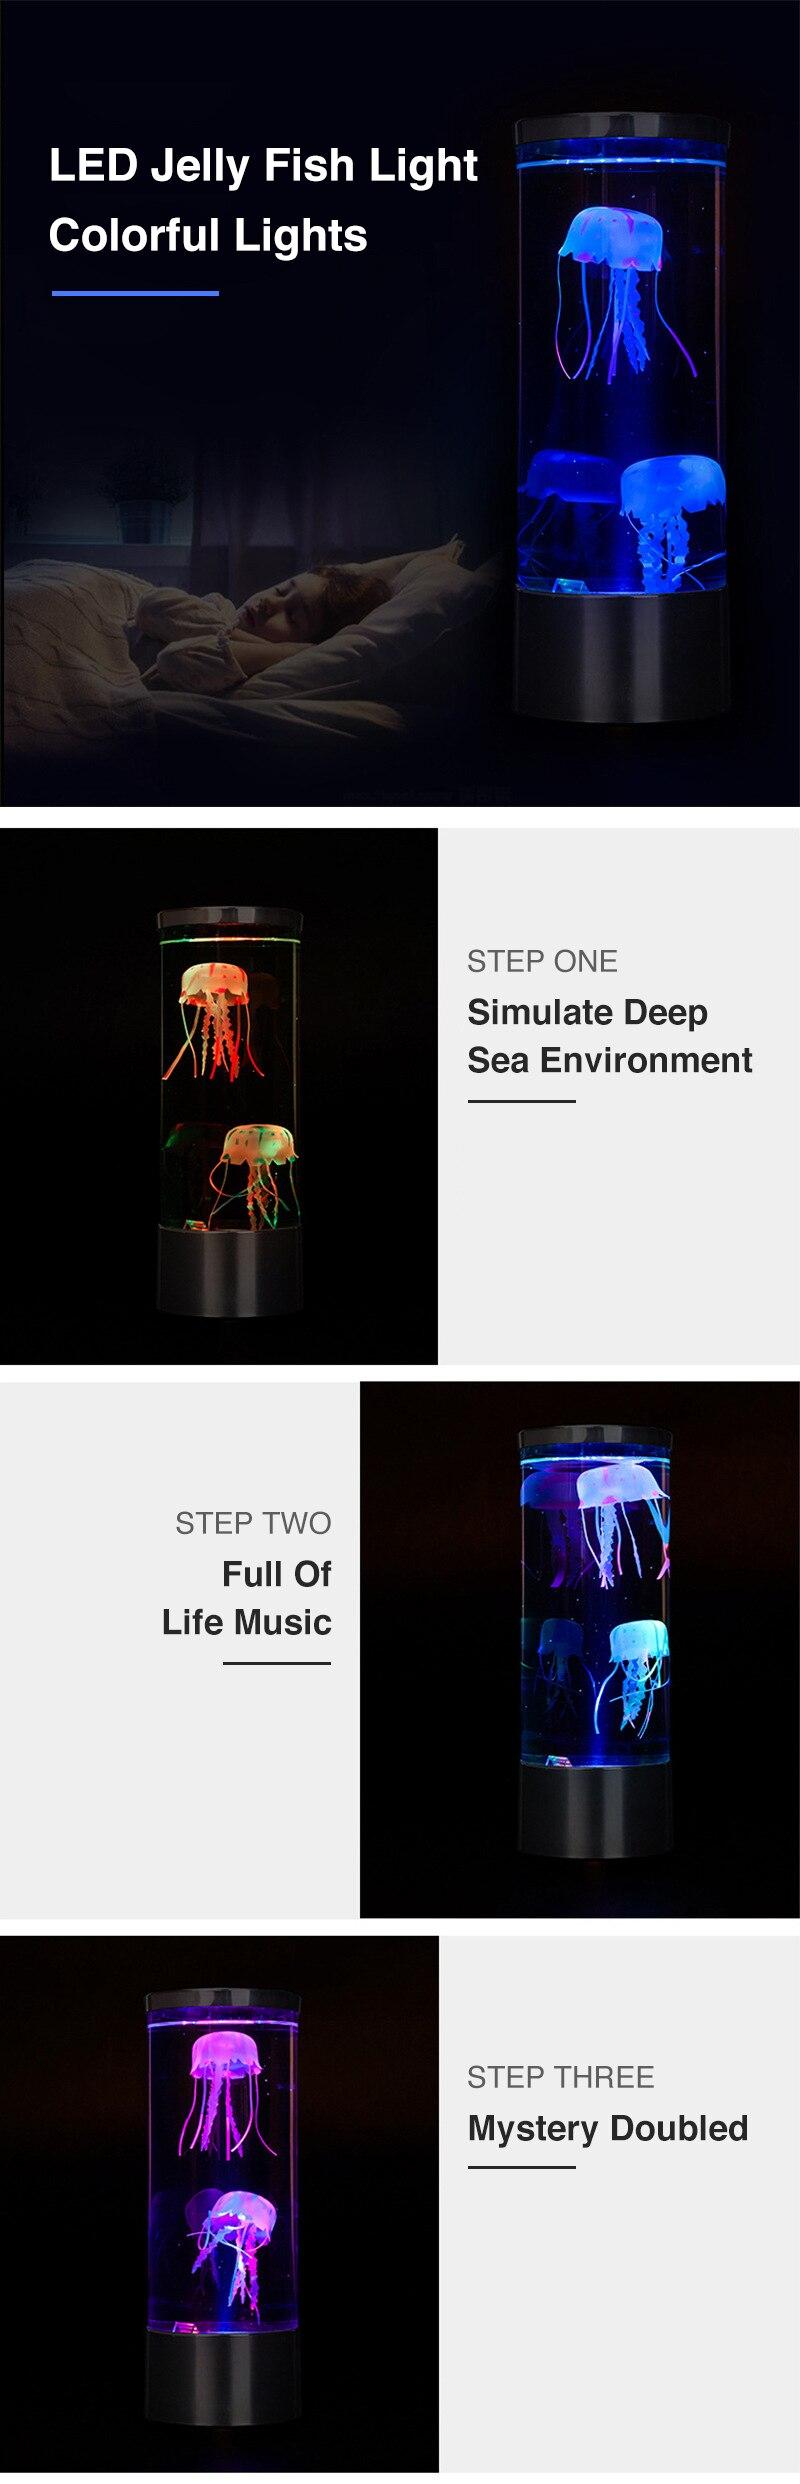 emissor de luz da água-viva realista sala